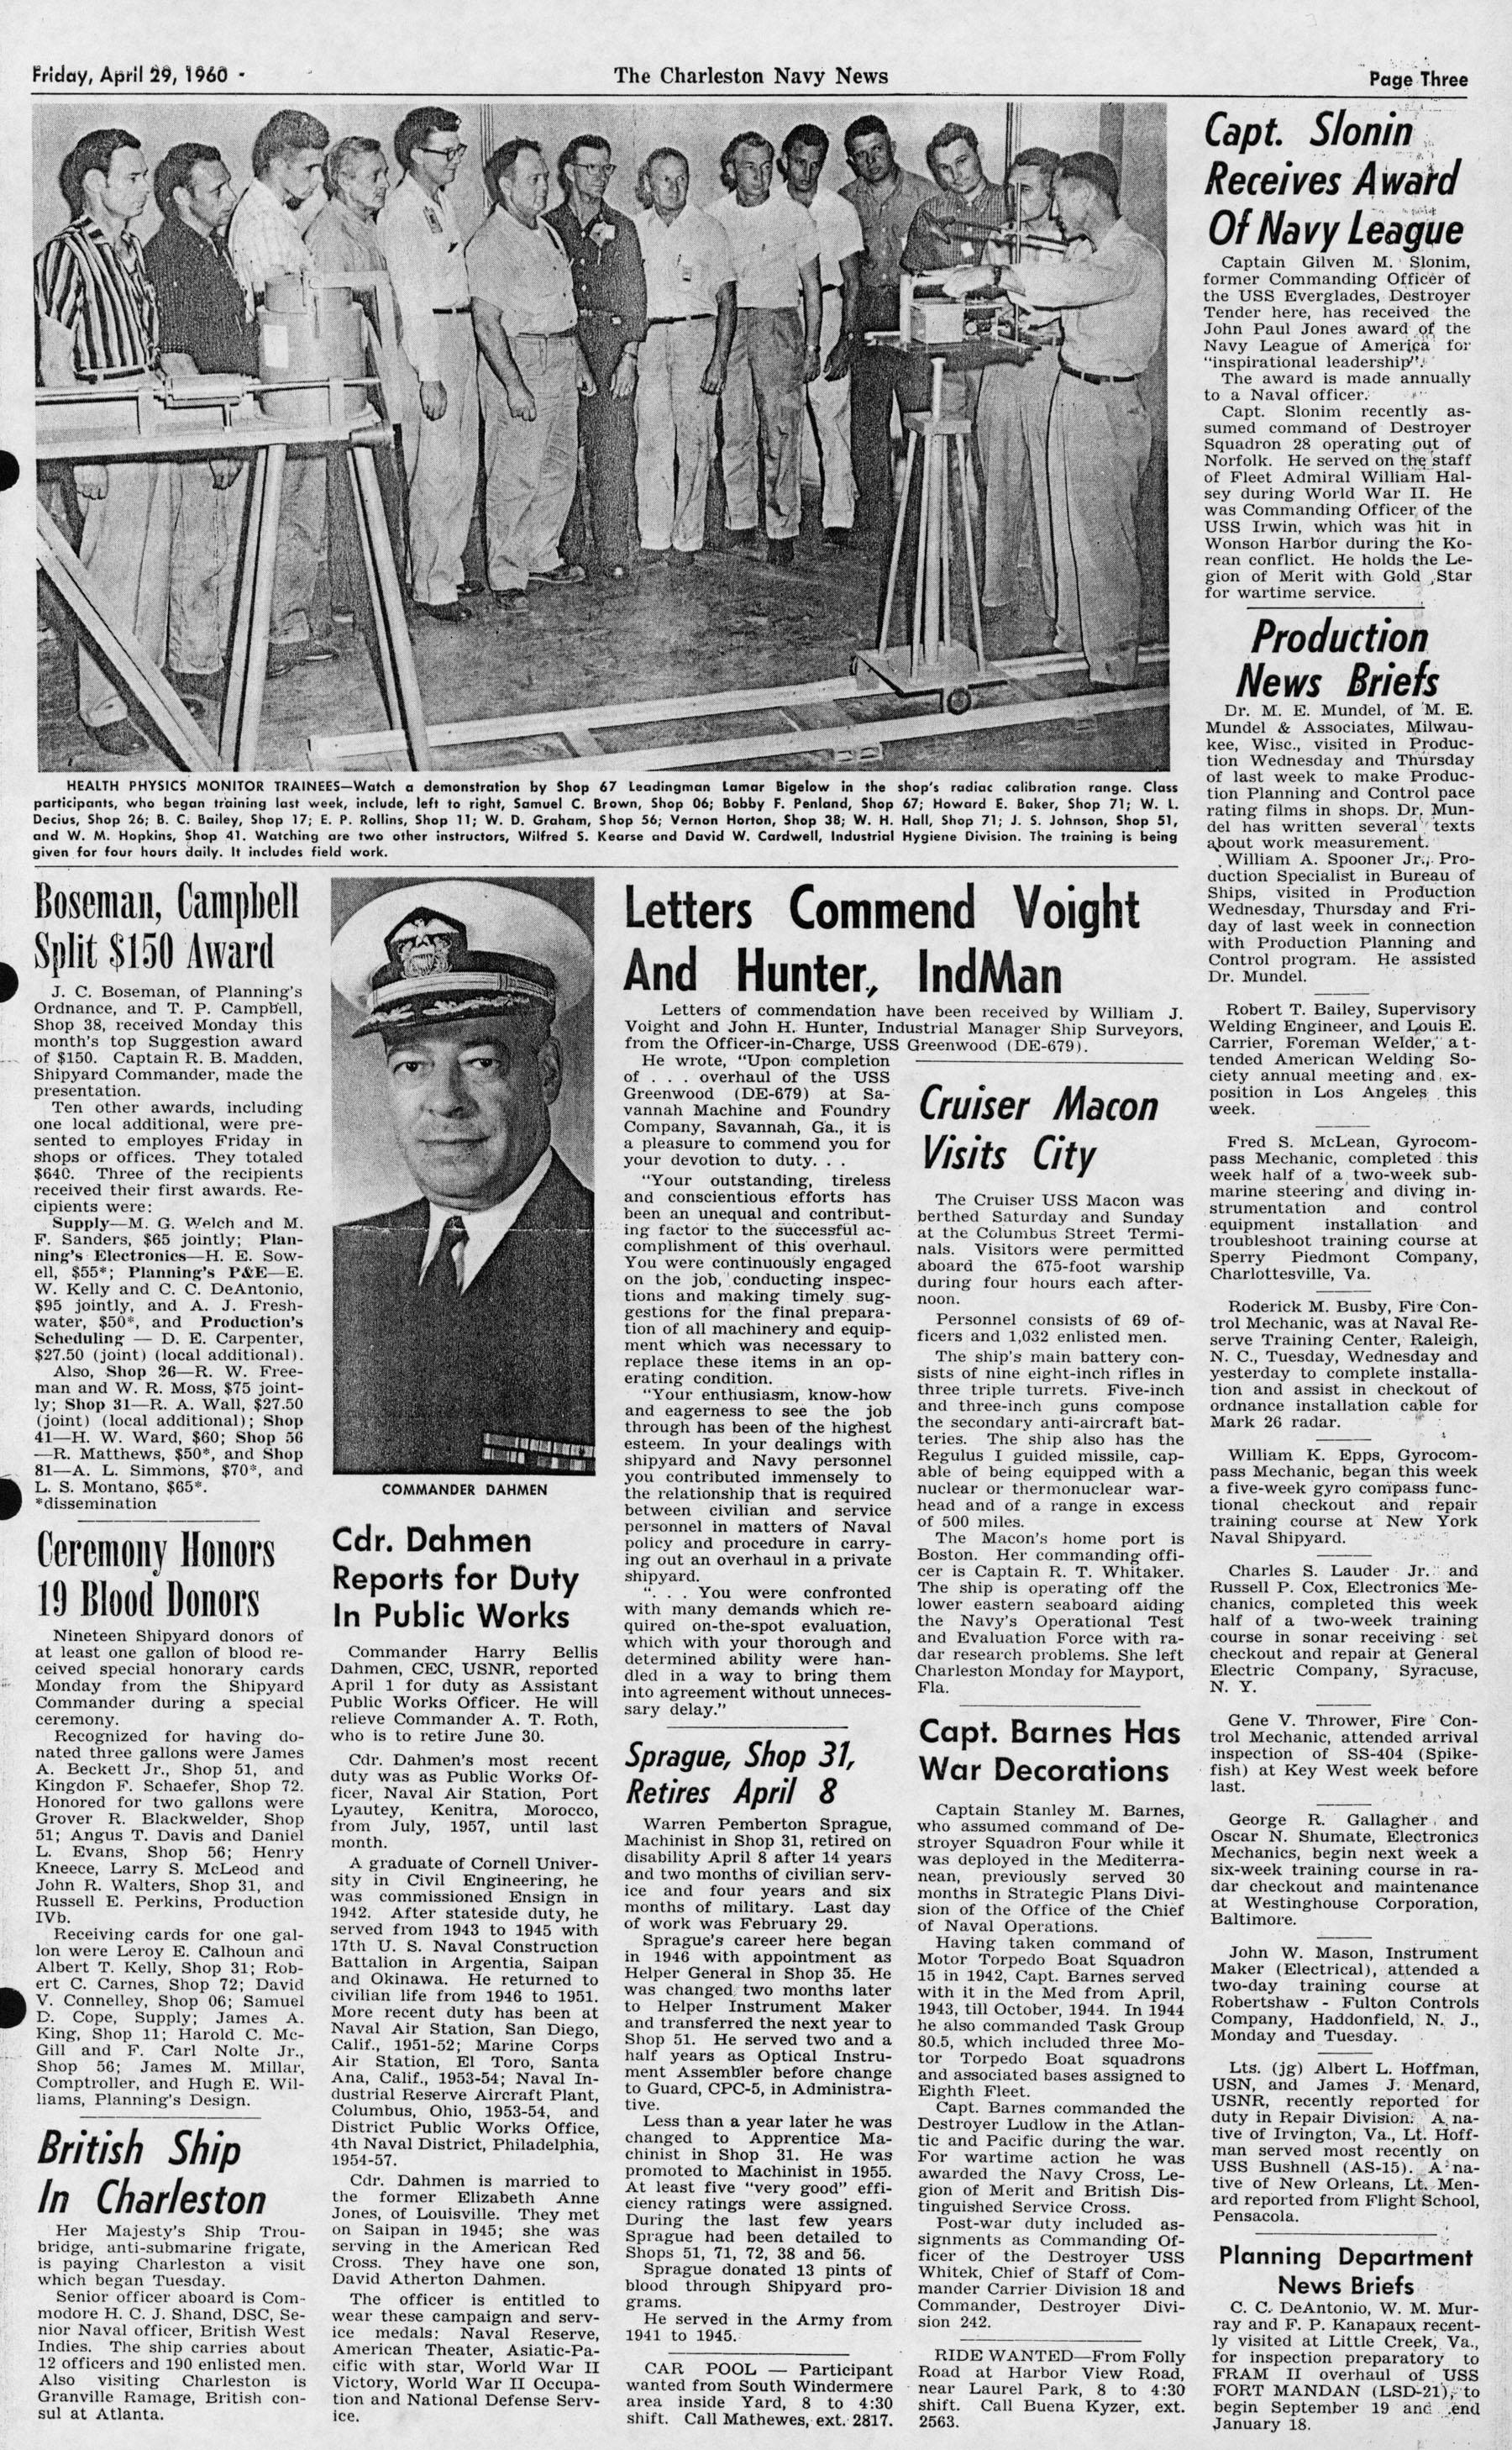 The Charleston Navy News, Volume 18, Edition 21, page iii